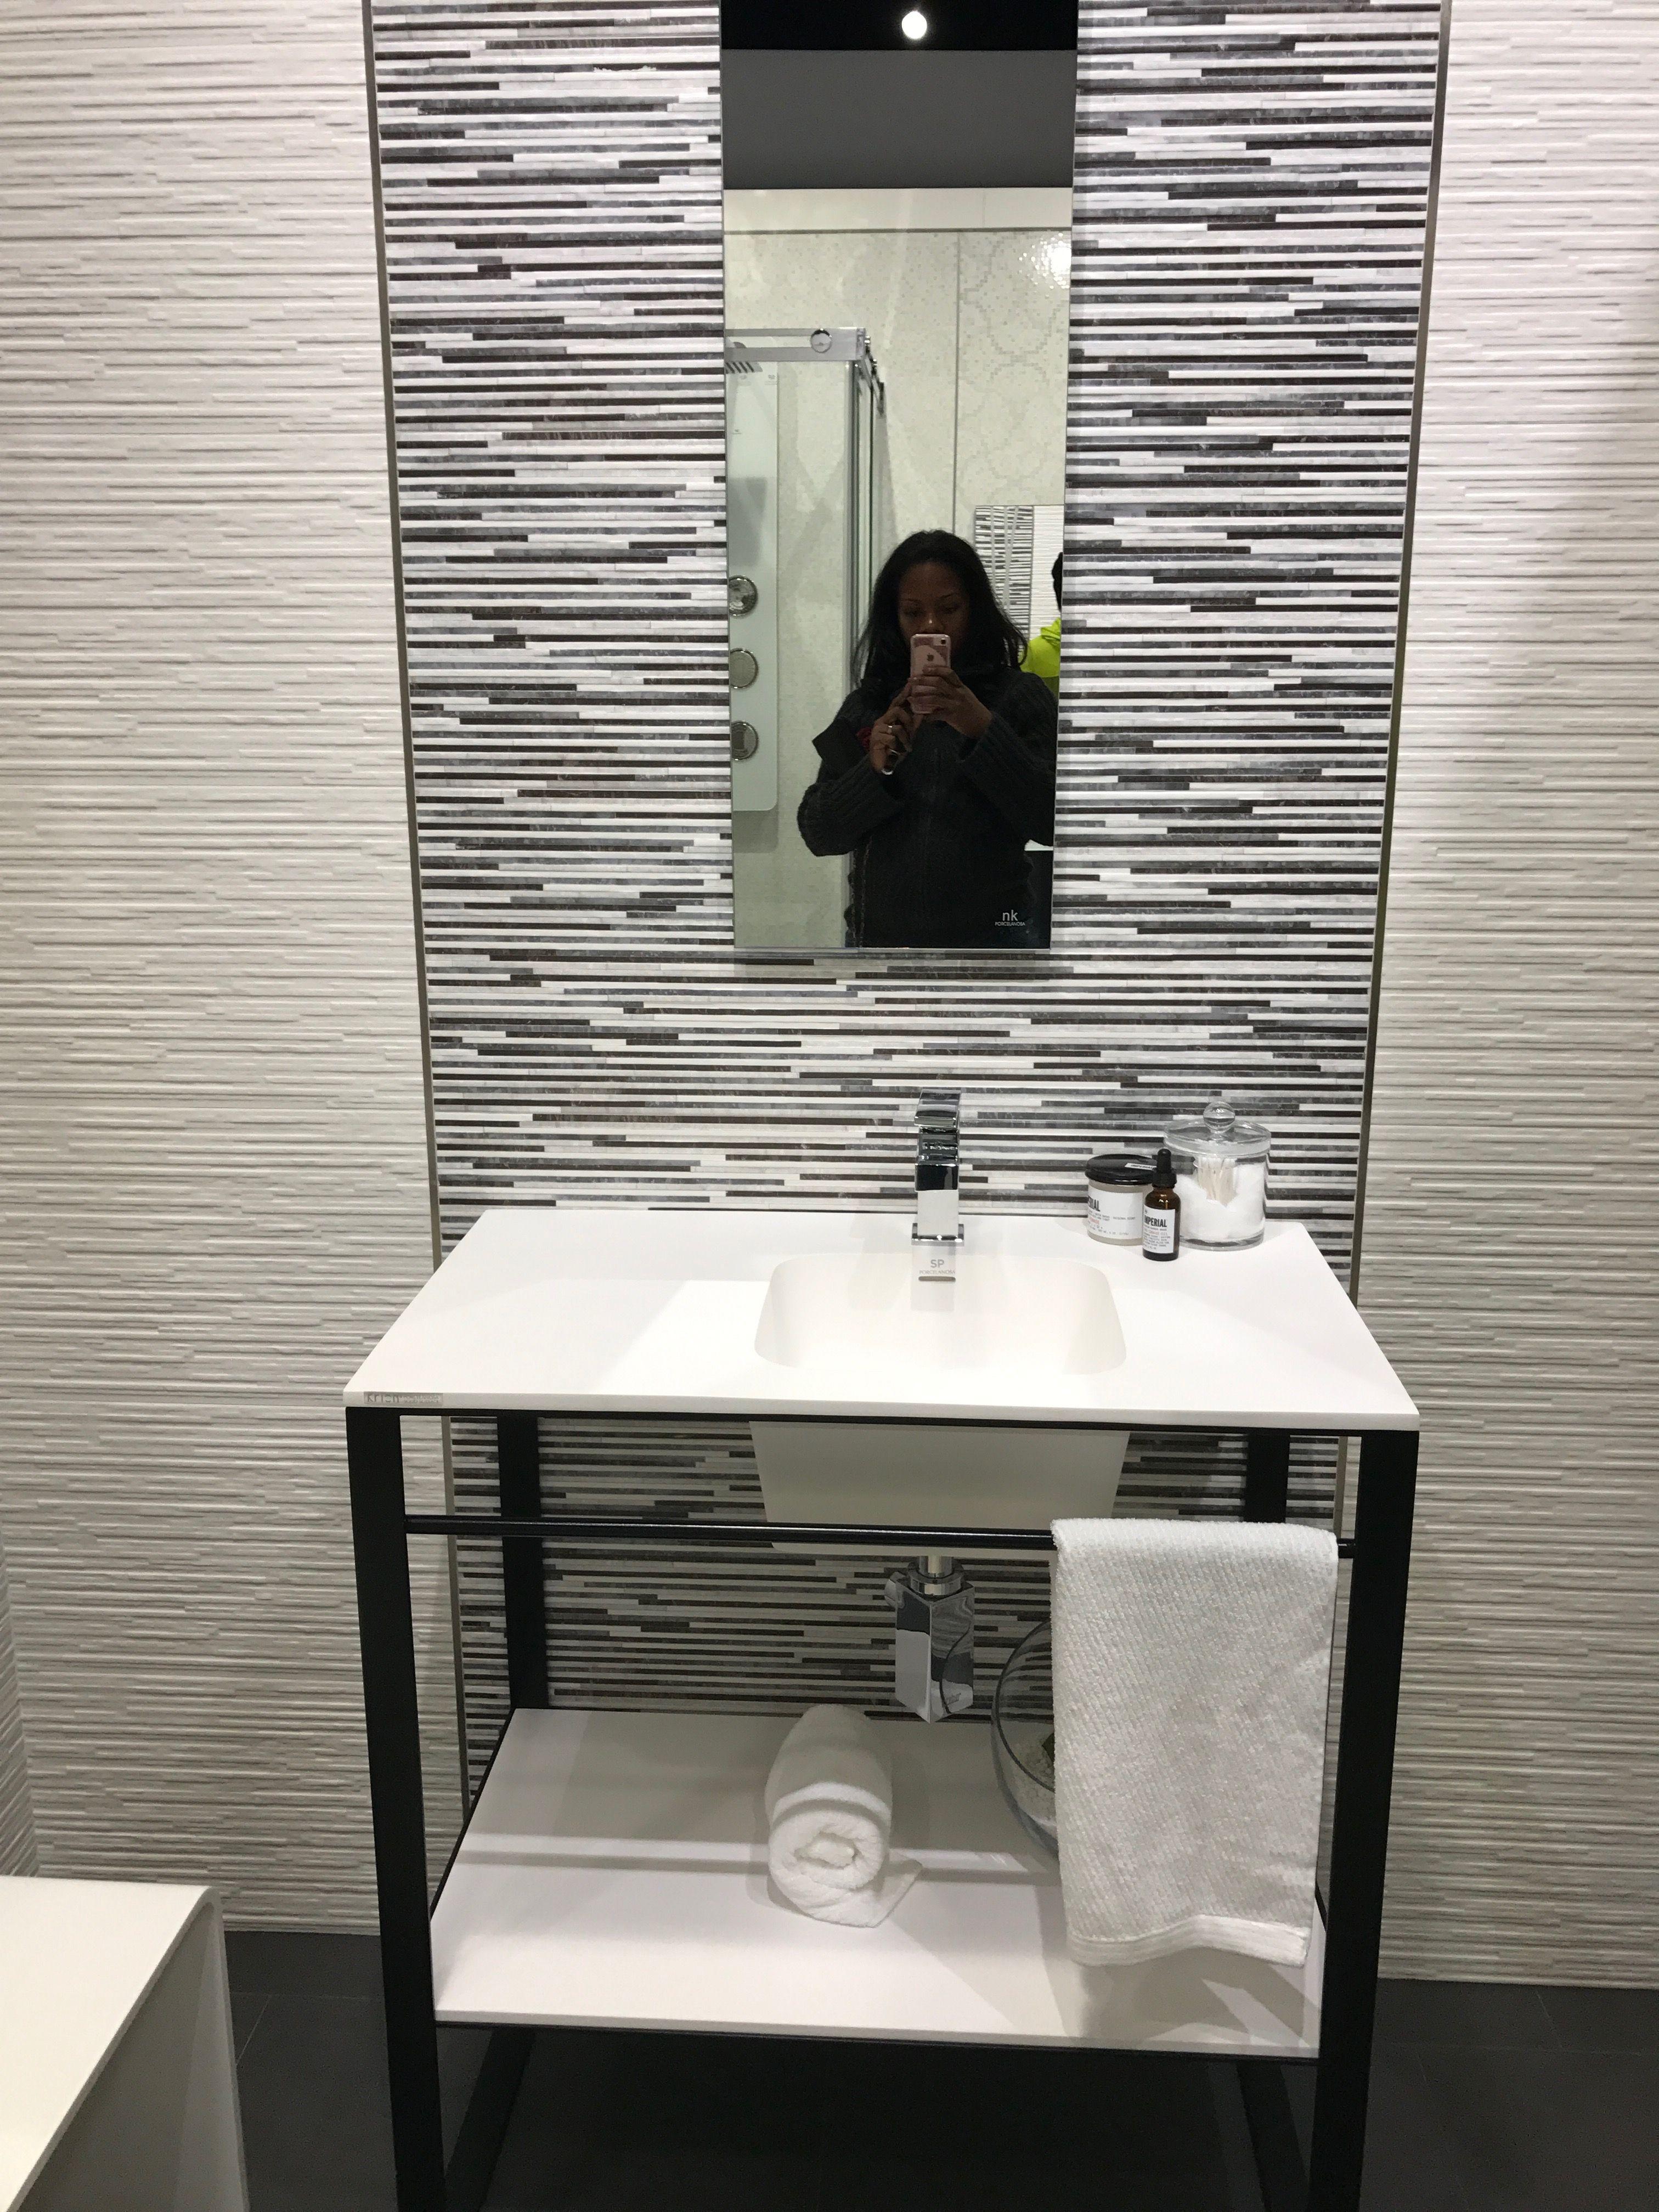 Pin by Anj on bath   Mirror selfie, Bath, Mirror